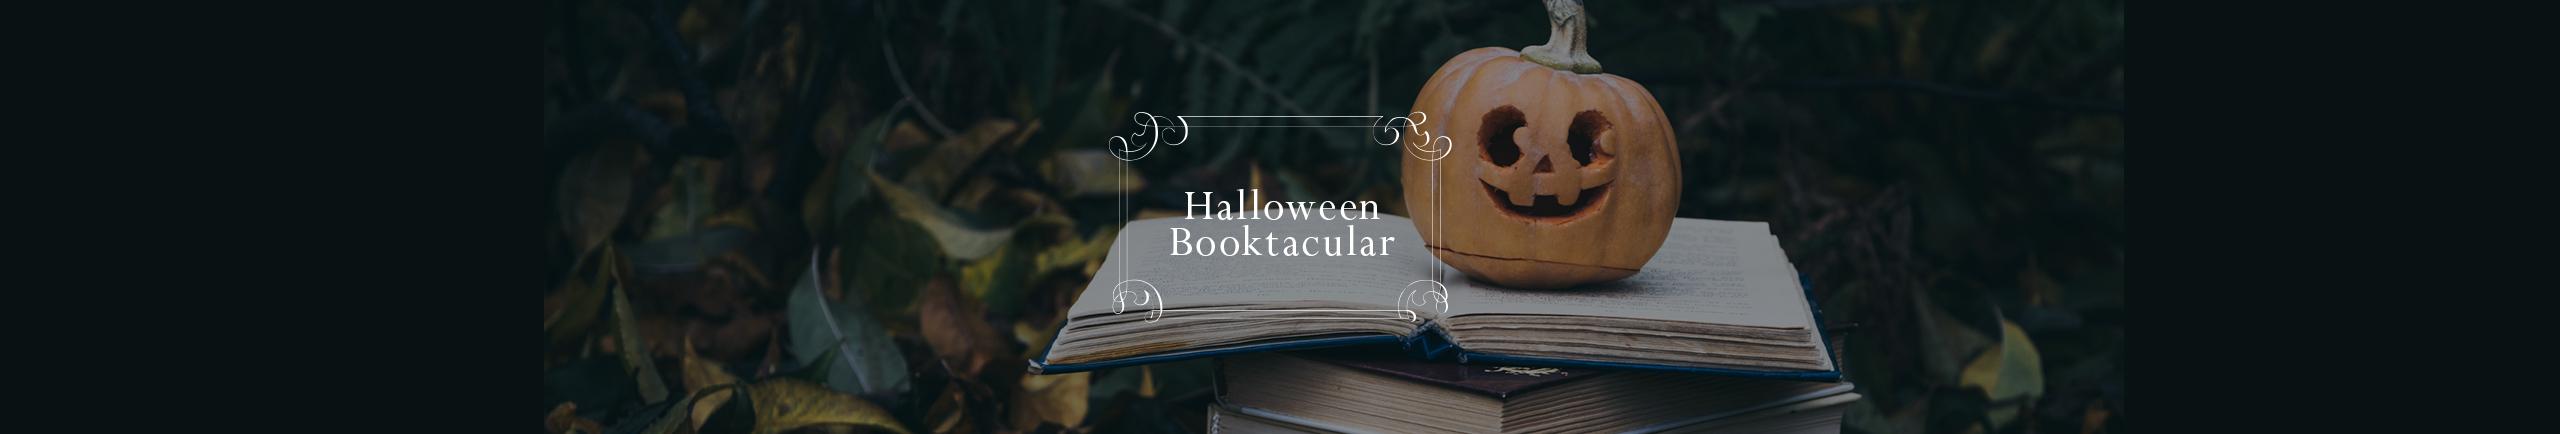 Halloween Booktacular